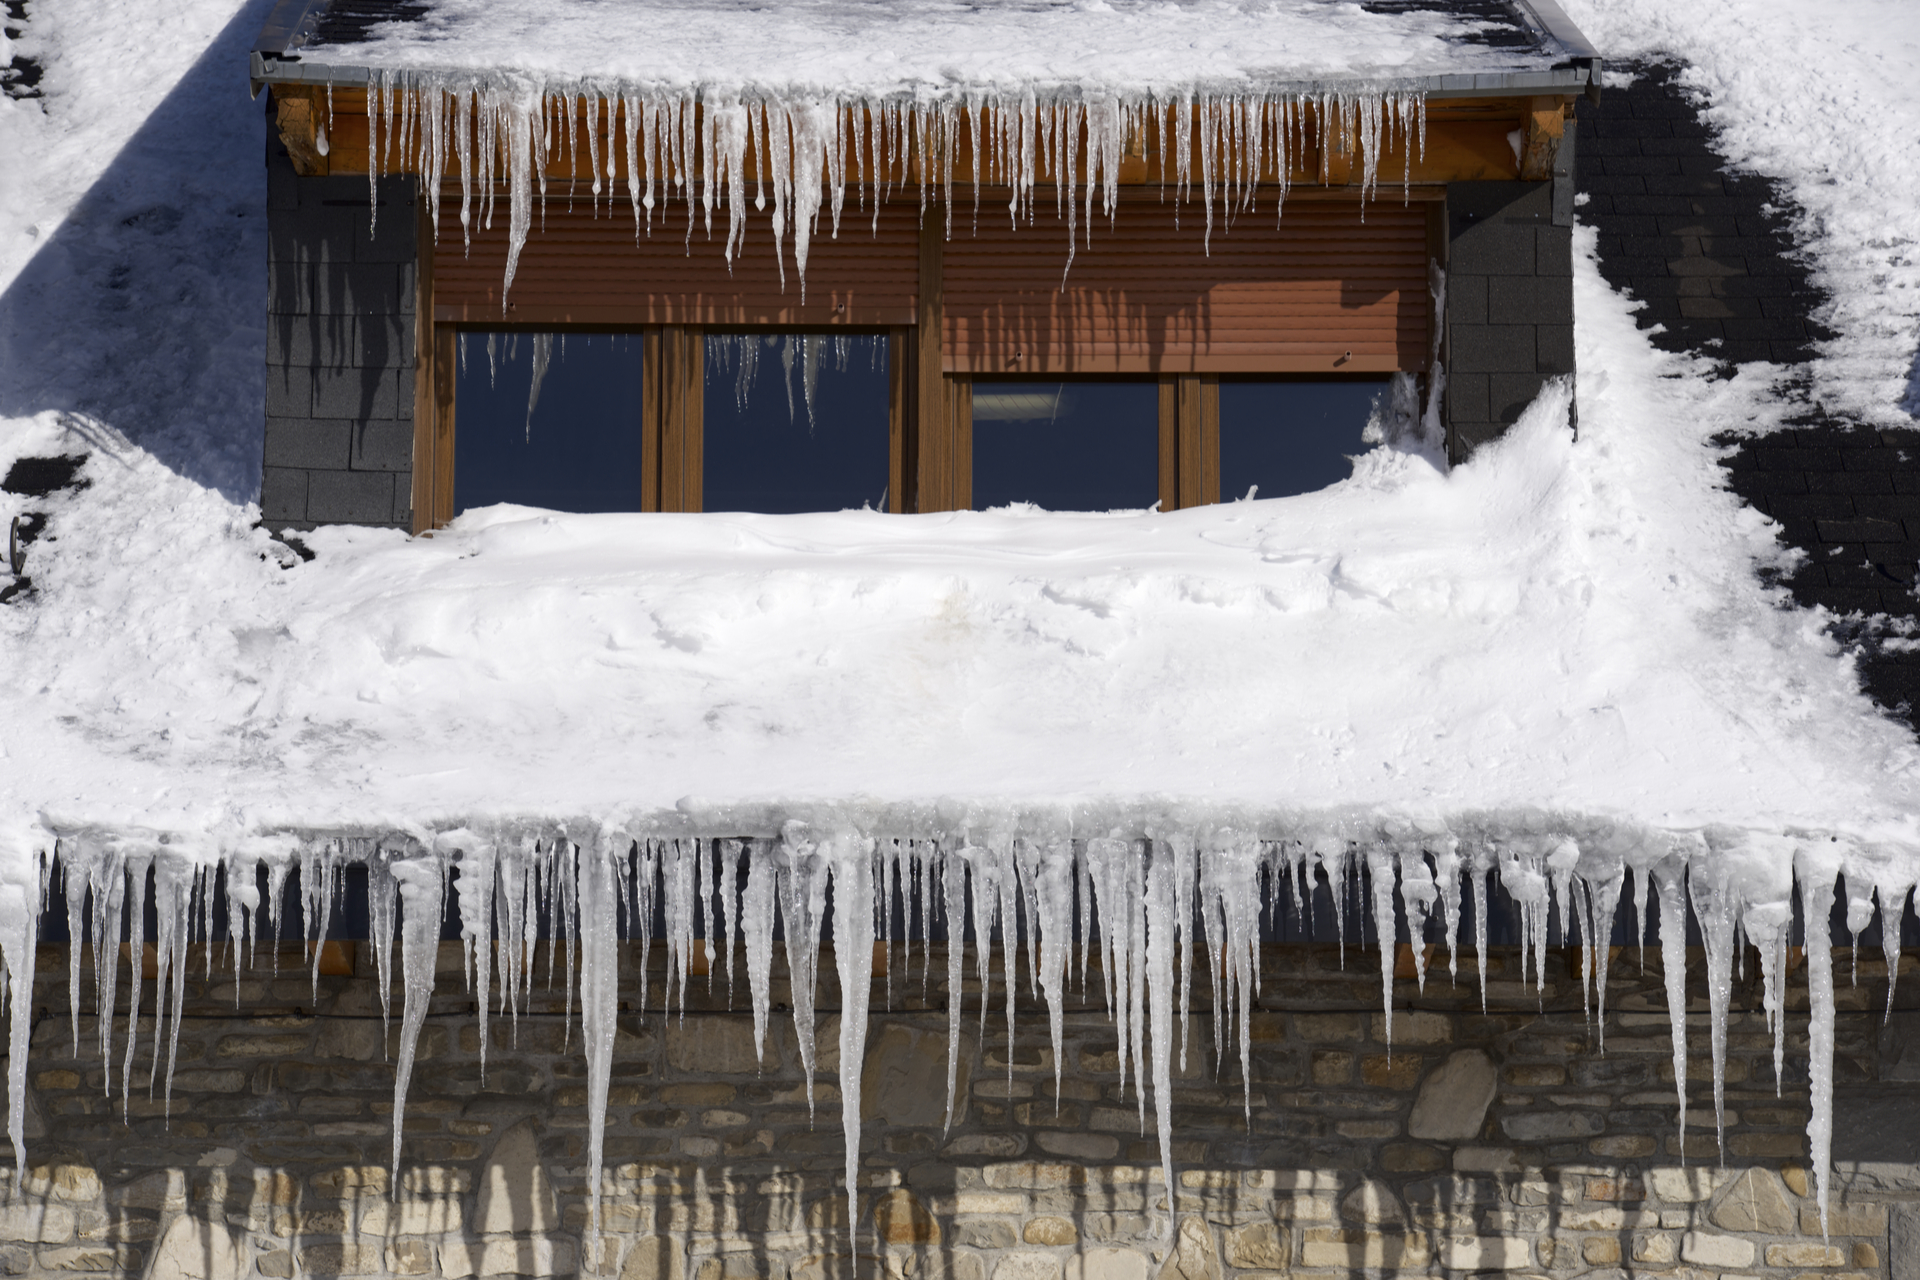 Winter Storm Roof Damage Repair Dallas DFW